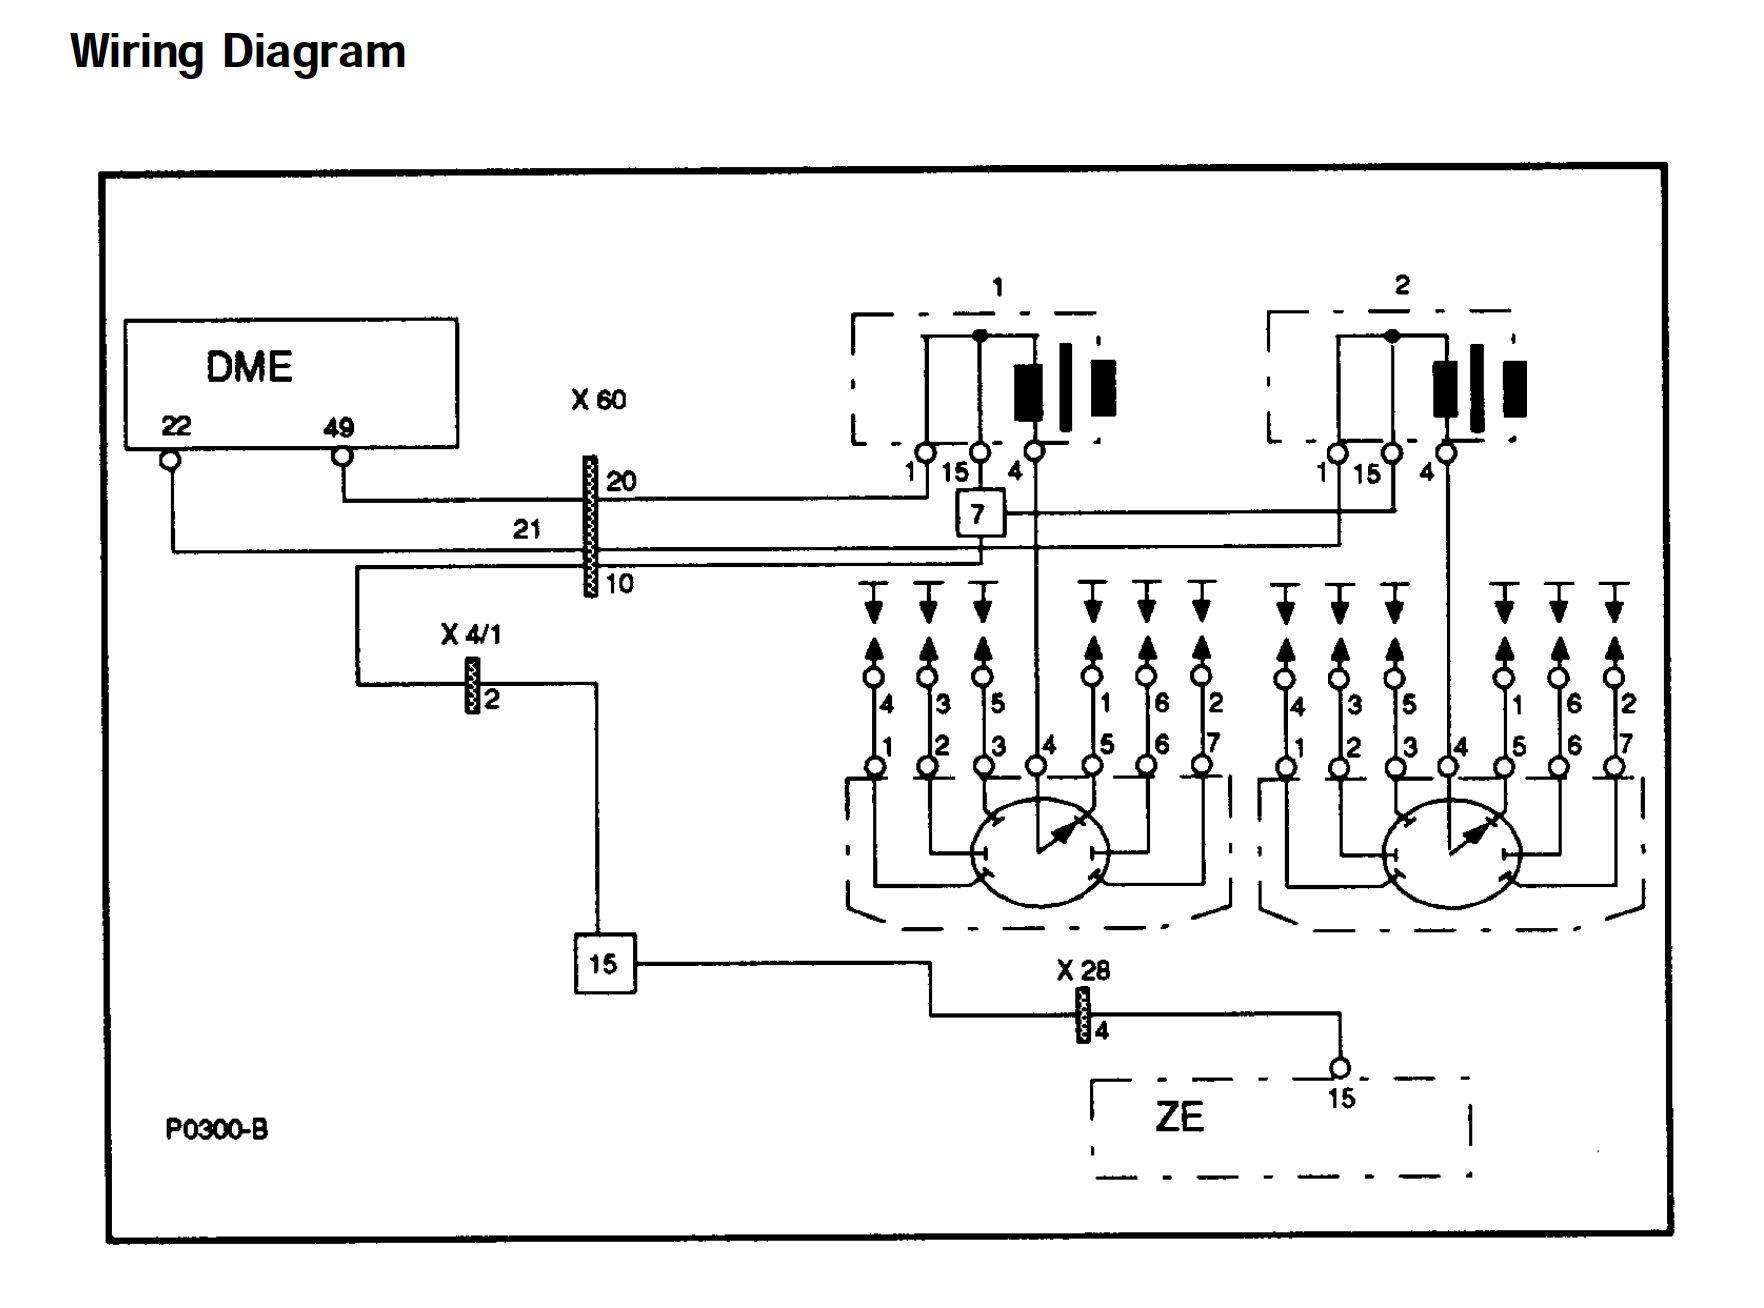 2006 crown victoria fuse diagram wiring diagrams schematics rh o d l co Light Switch Wiring Diagram Schematic Circuit Diagram